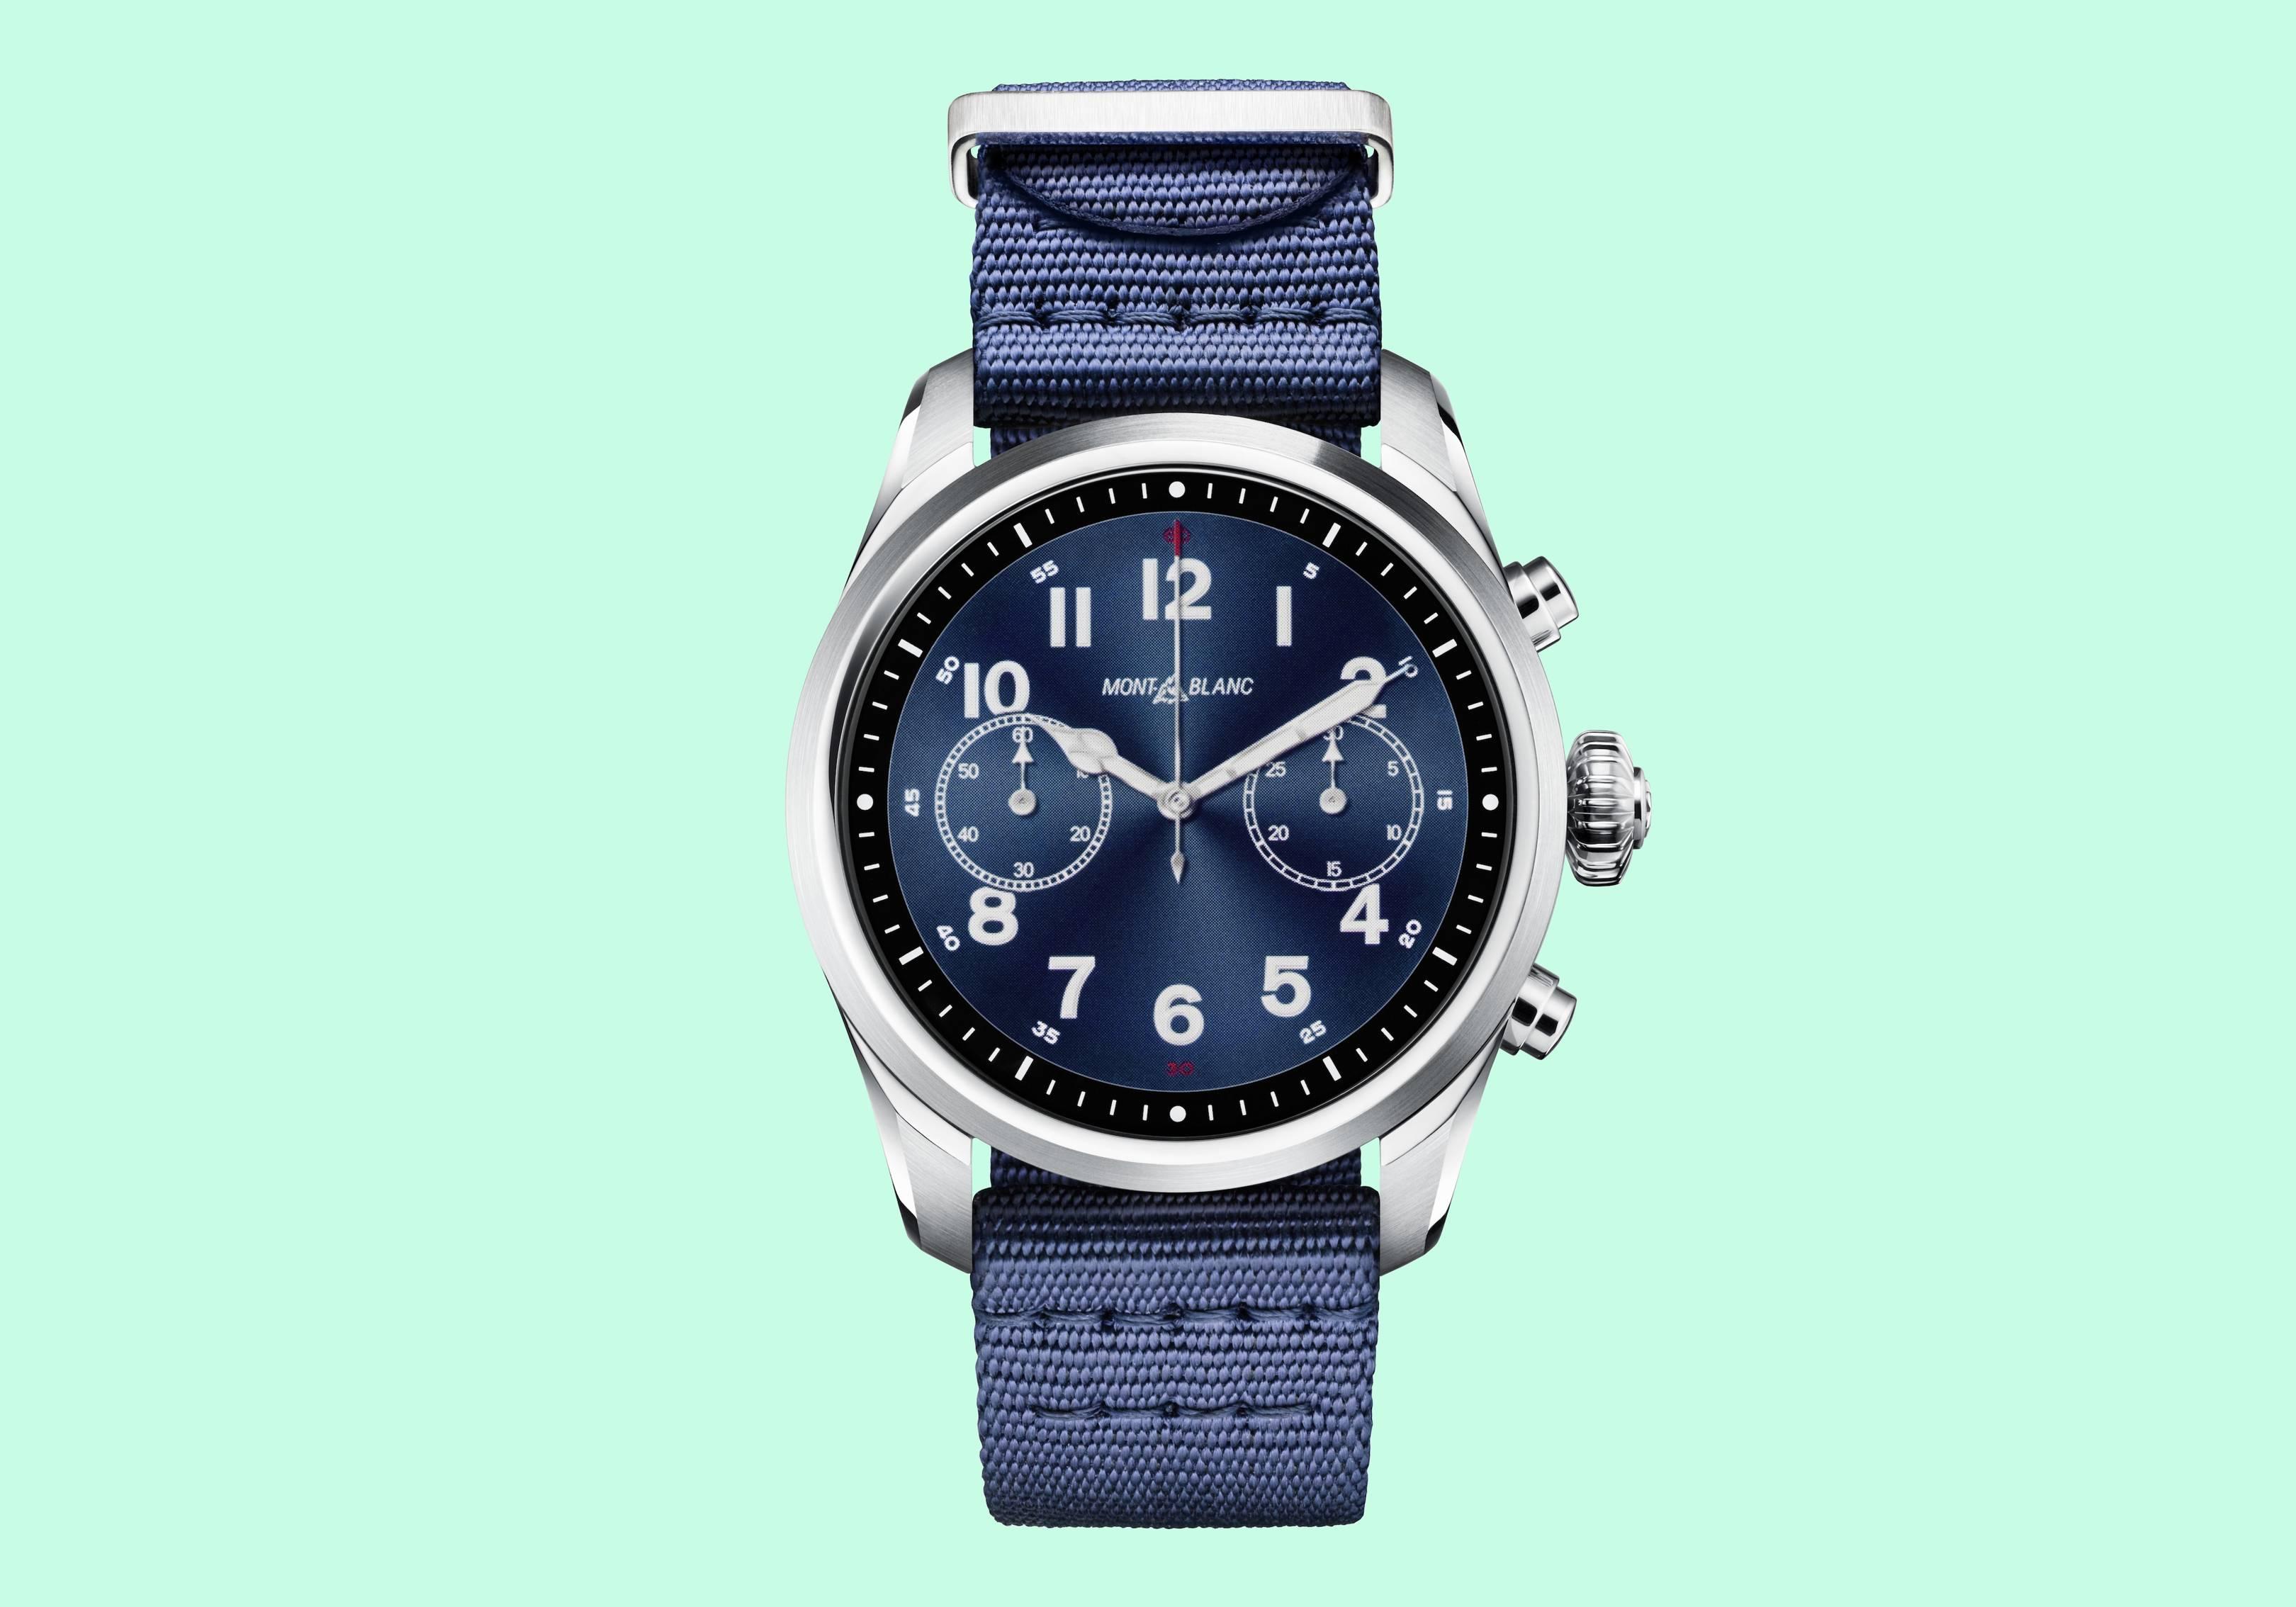 Montblanc's Summit 2 is the latest luxury smartwatch contender